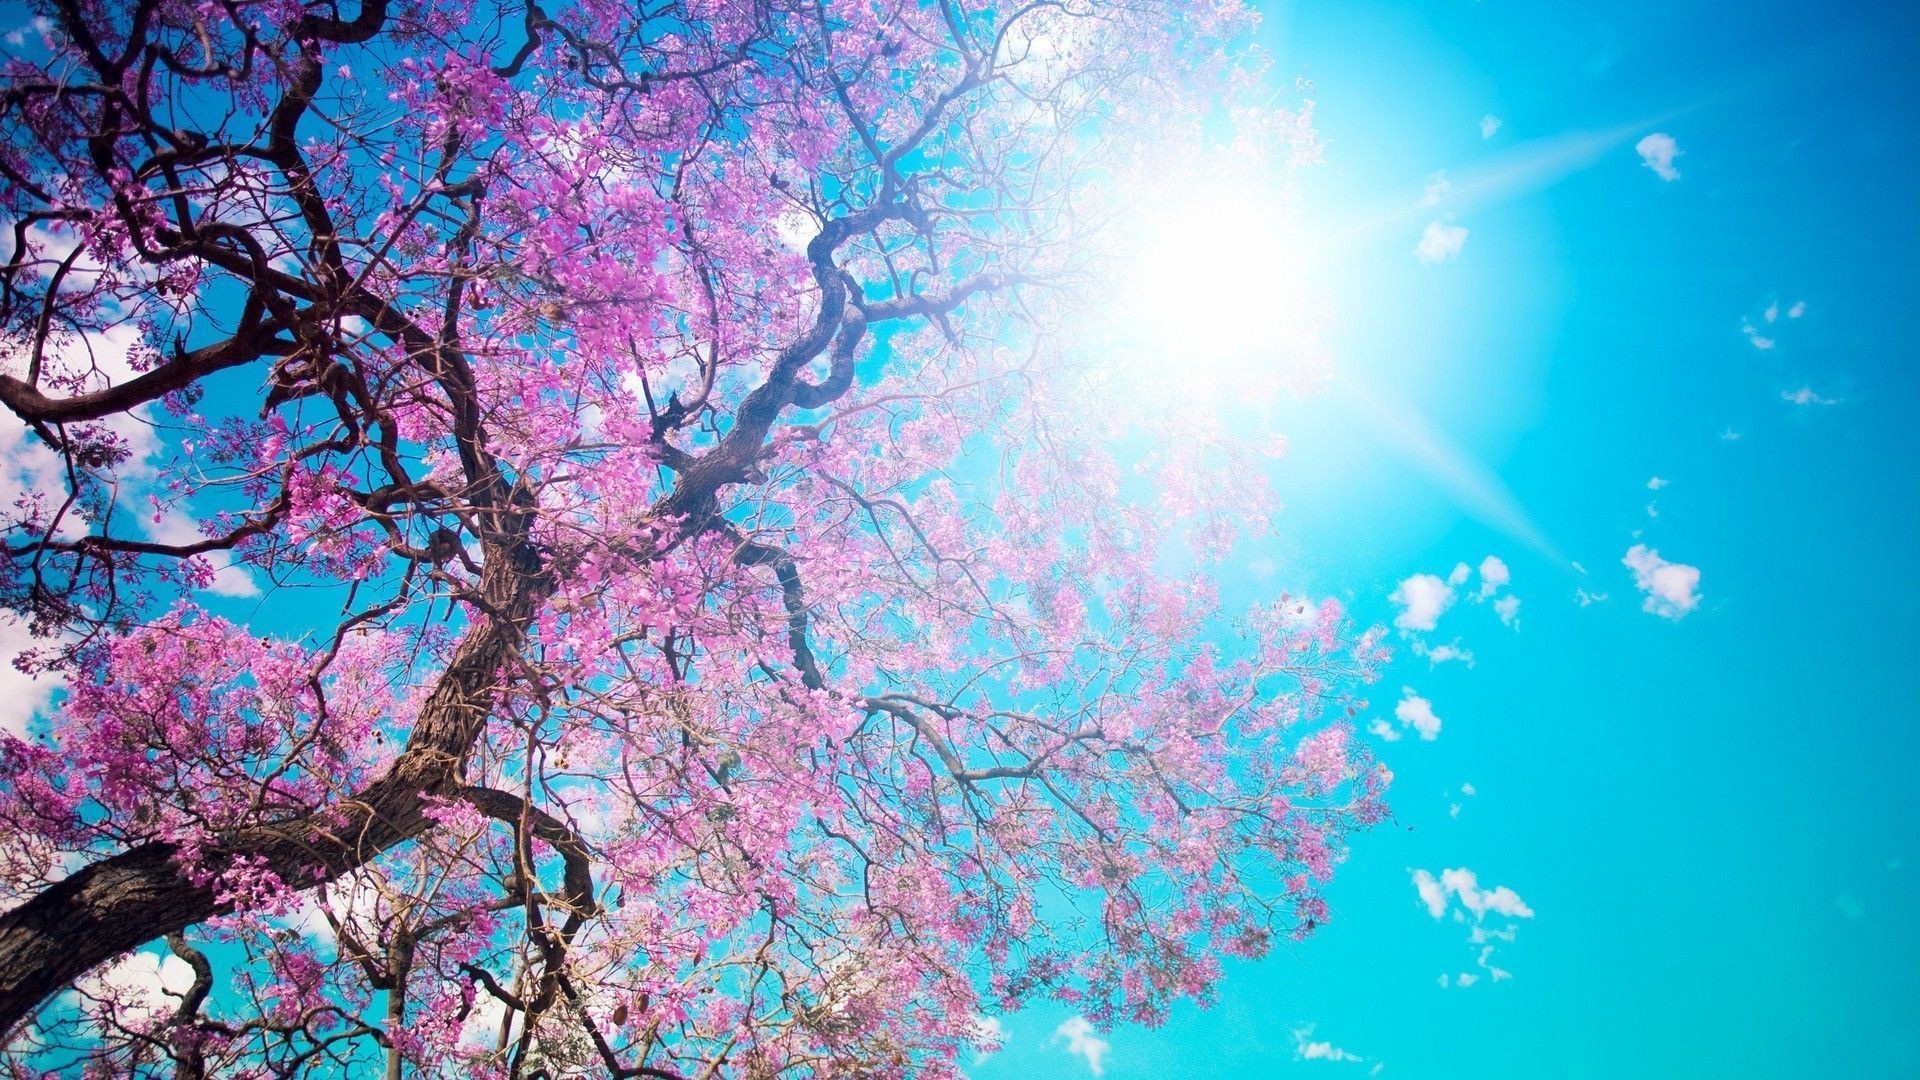 Cherry Blossom Desktop Wallpapers – Wallpaper Cave